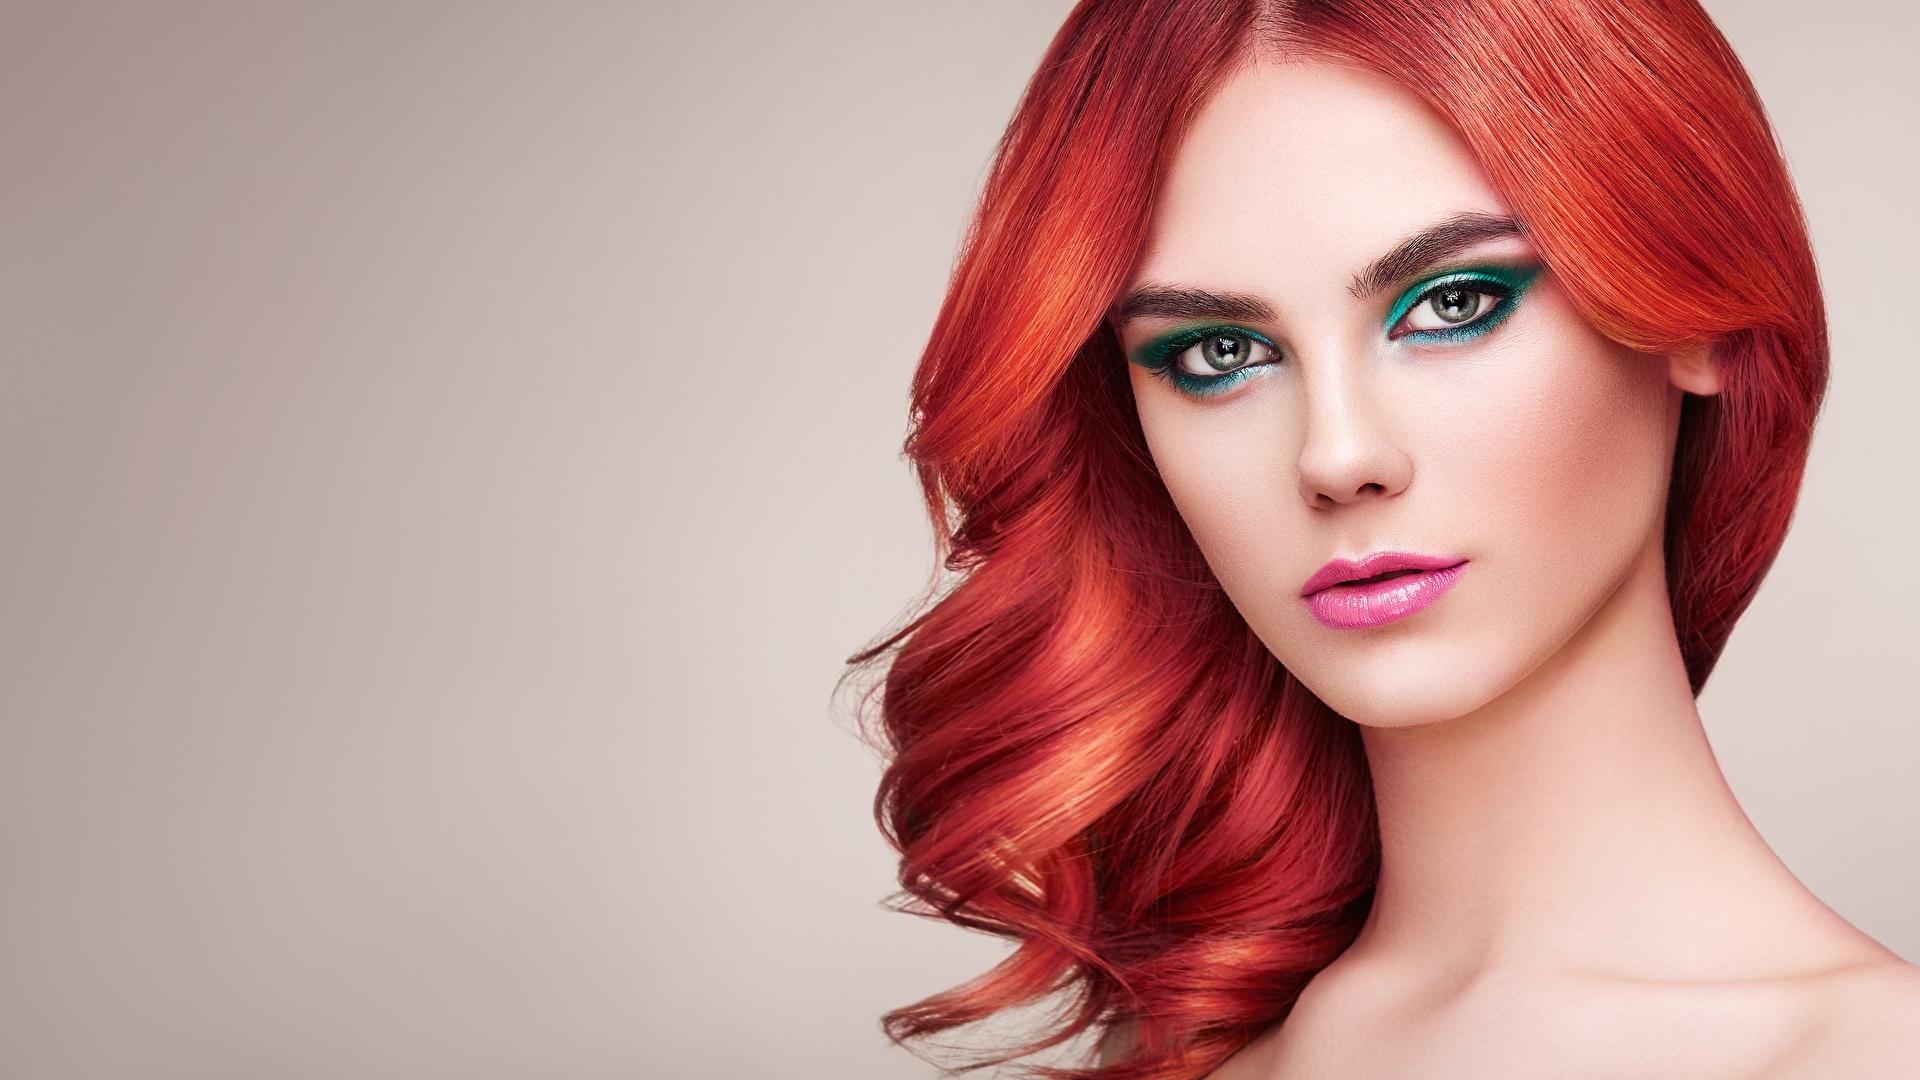 Picture Redhead Girl Makeup Oleg Gekman Beautiful Hair 1920x1080